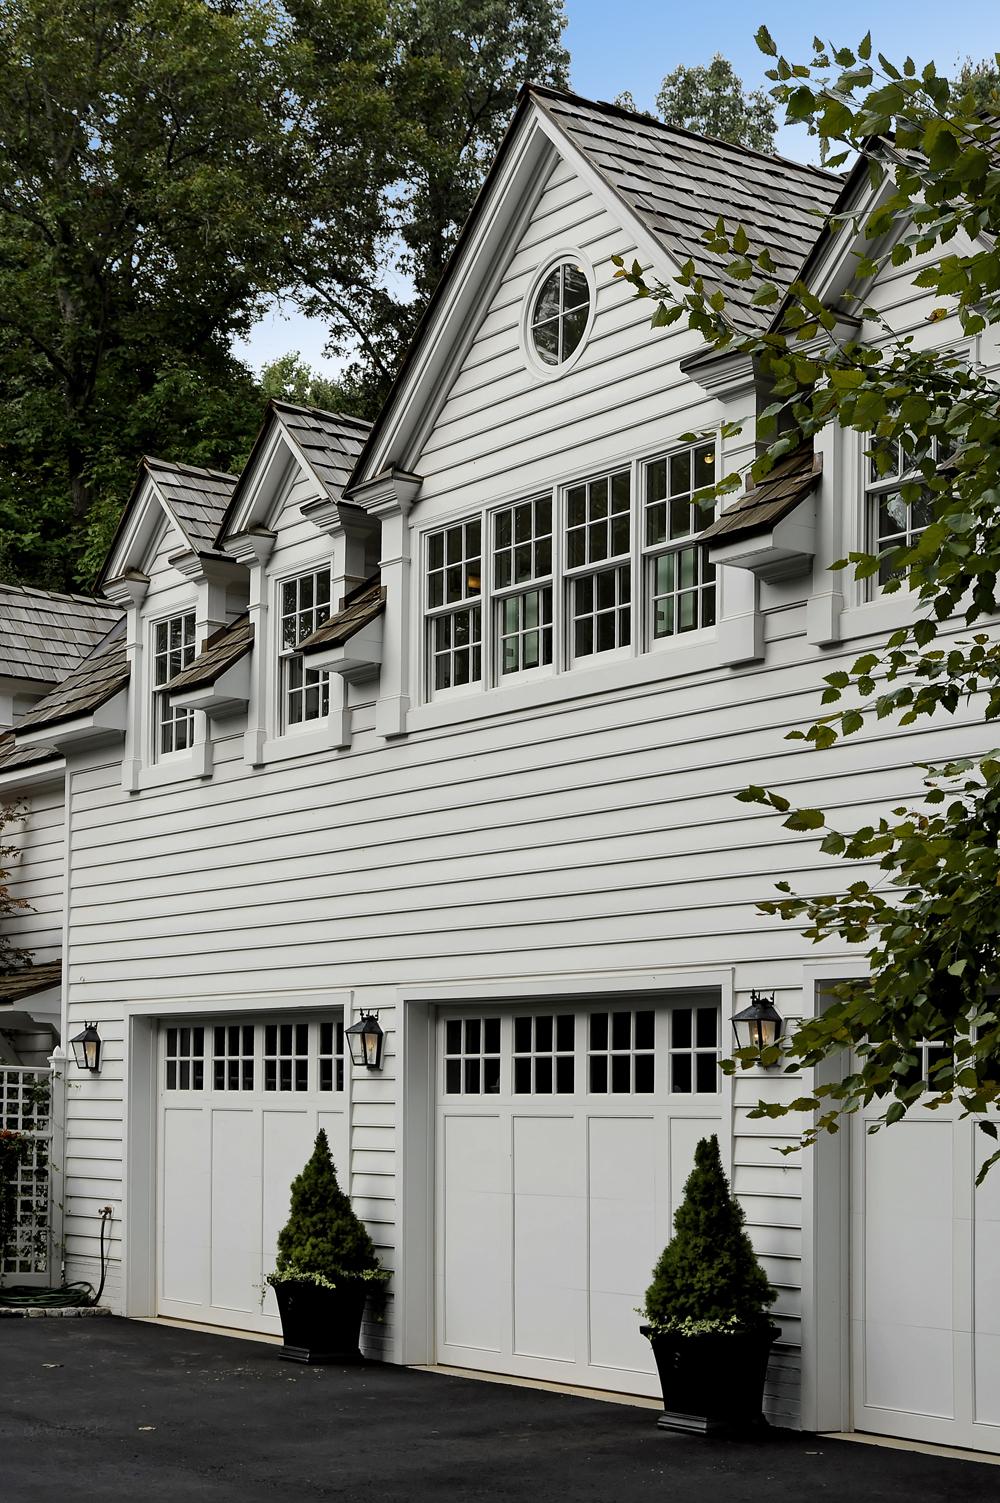 Garages Photo Gallery | BOWA | Design Build Renovations